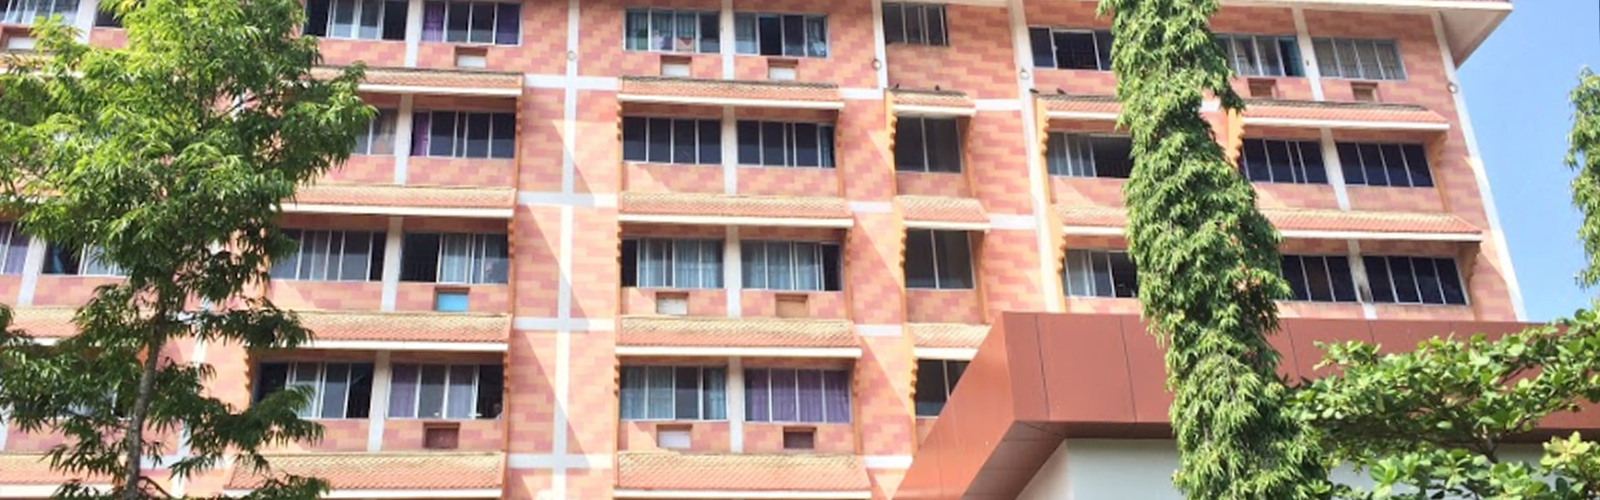 Sree Uthradom Thirunal (SUT) Hospital - Trivandrum Image